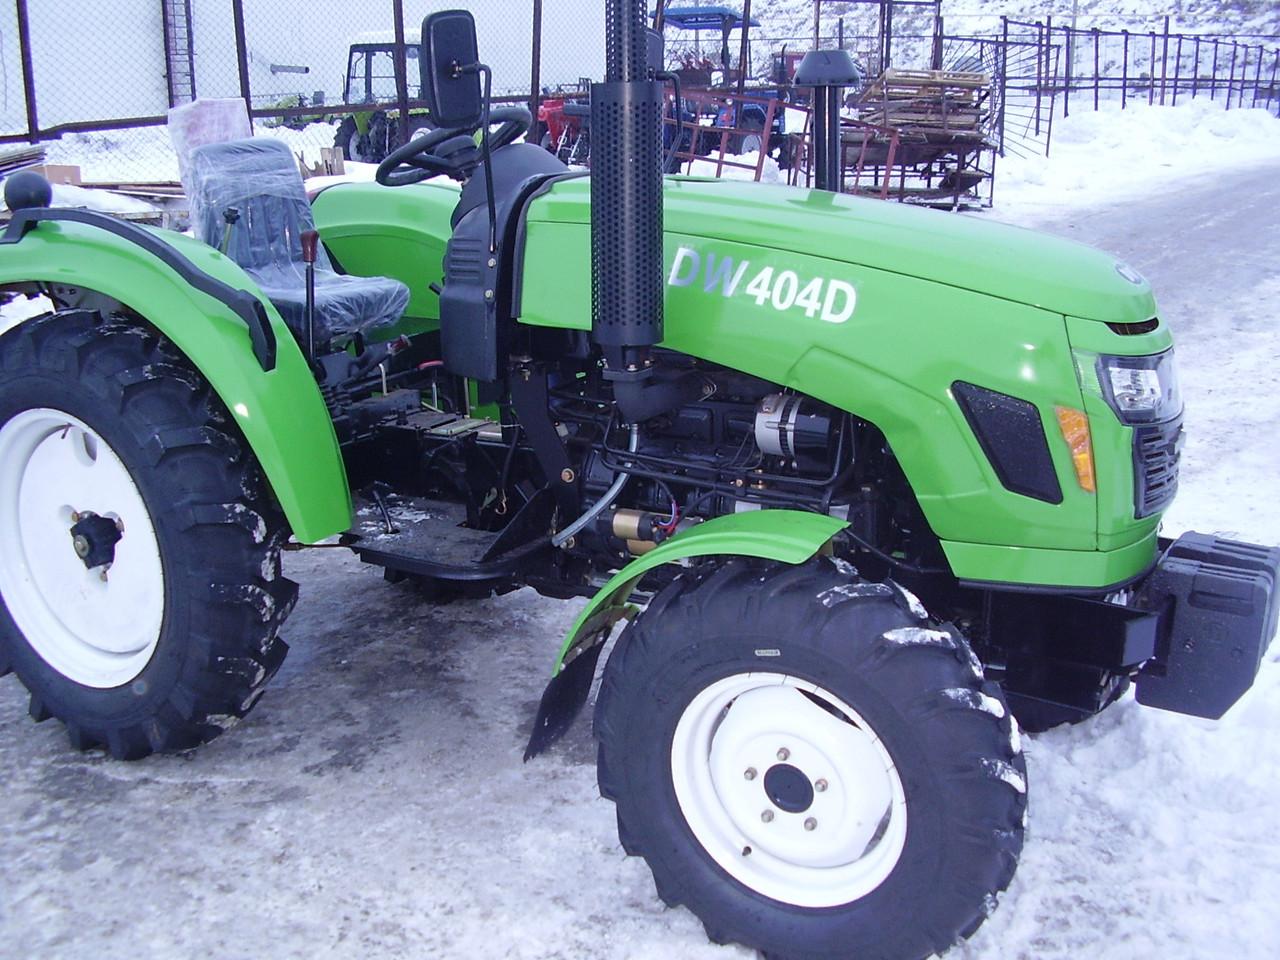 Трактор DW 404DR, (24 л.с., 4х4, 4 цил., ГУР, КПП реверс)